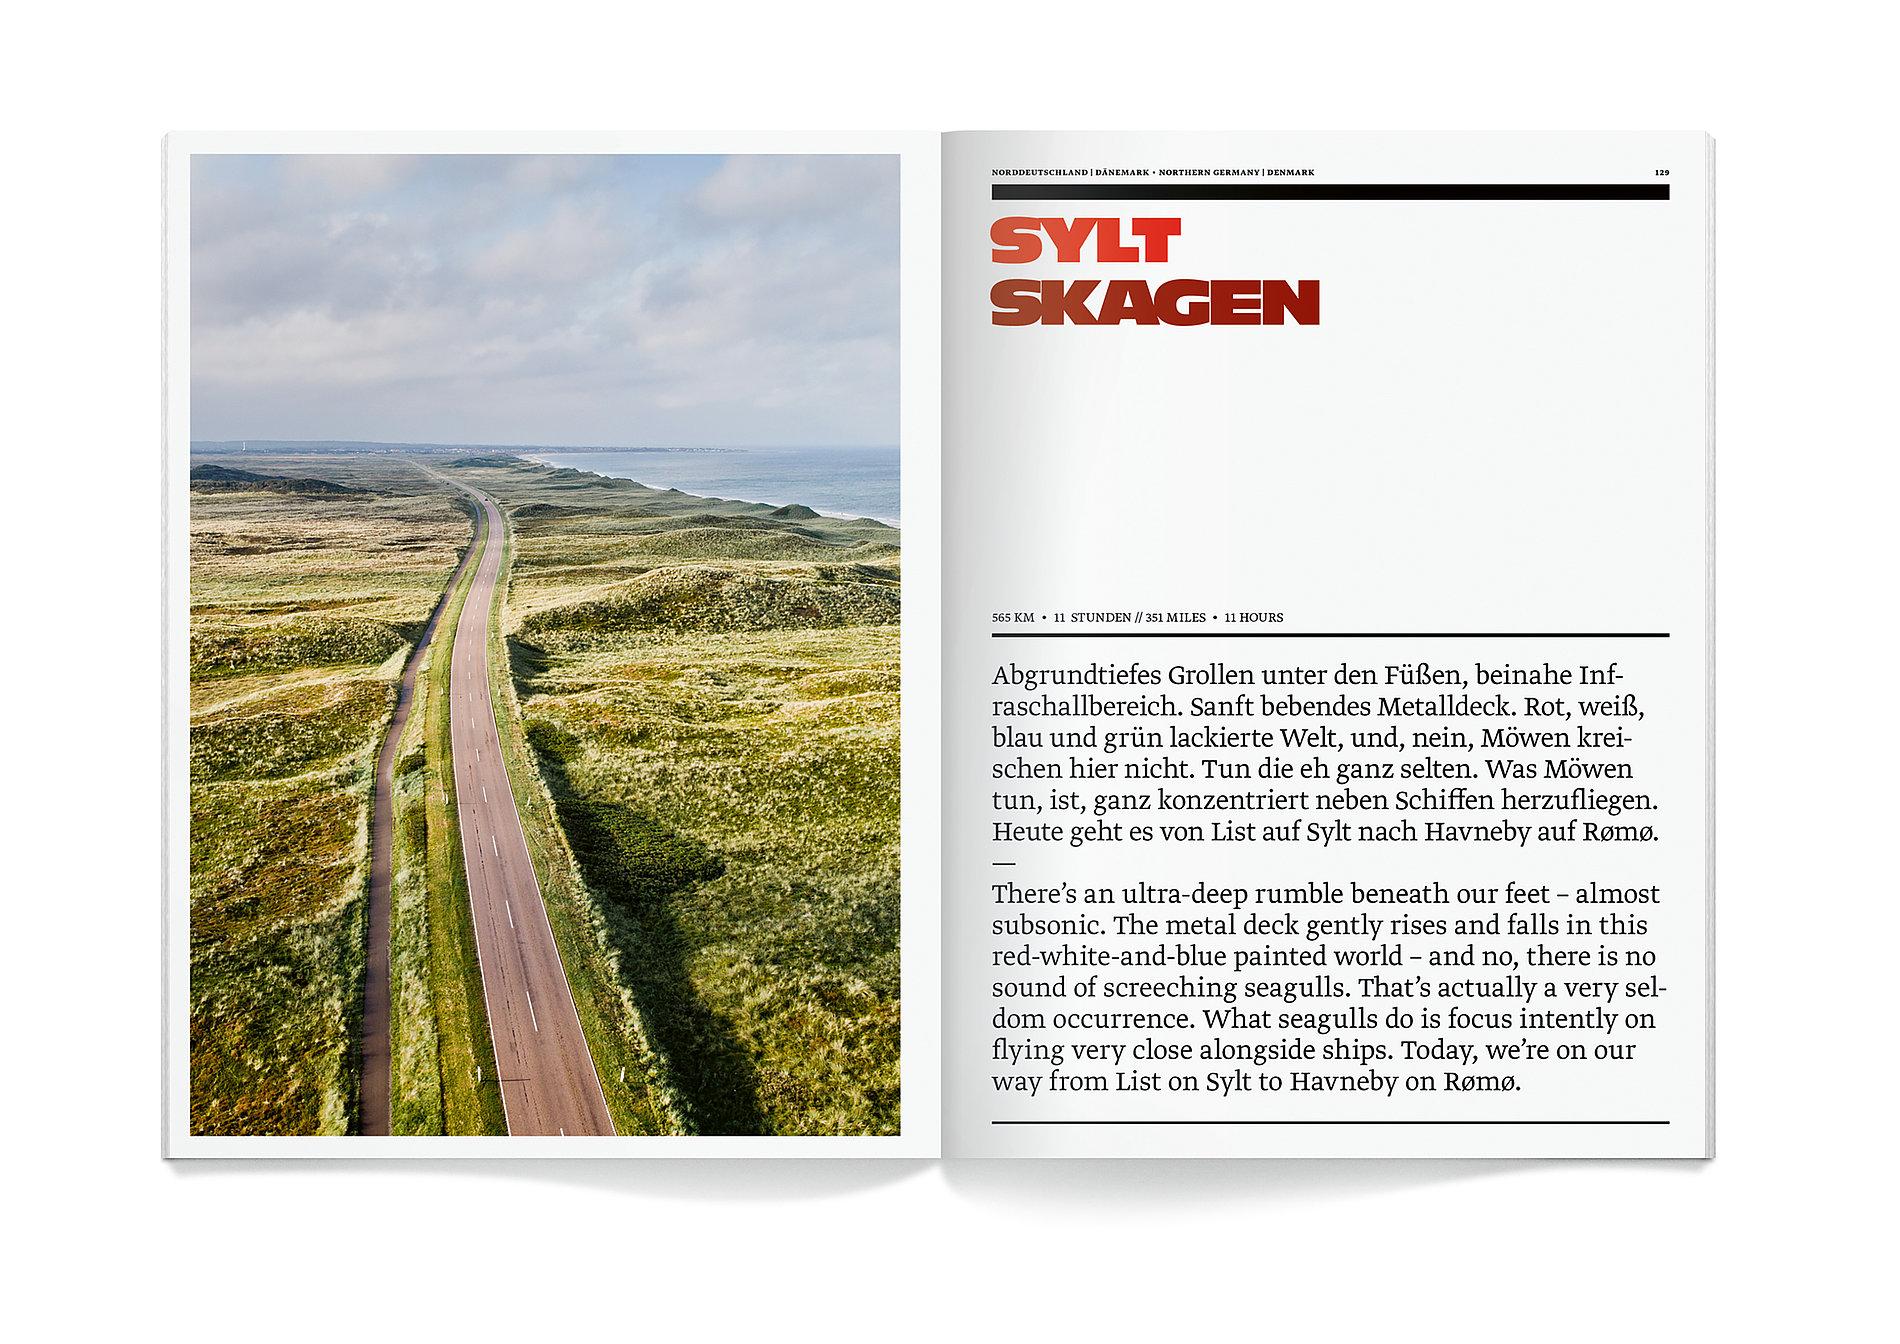 CURVES – Germany's Coastline/Denmark | Red Dot Design Award